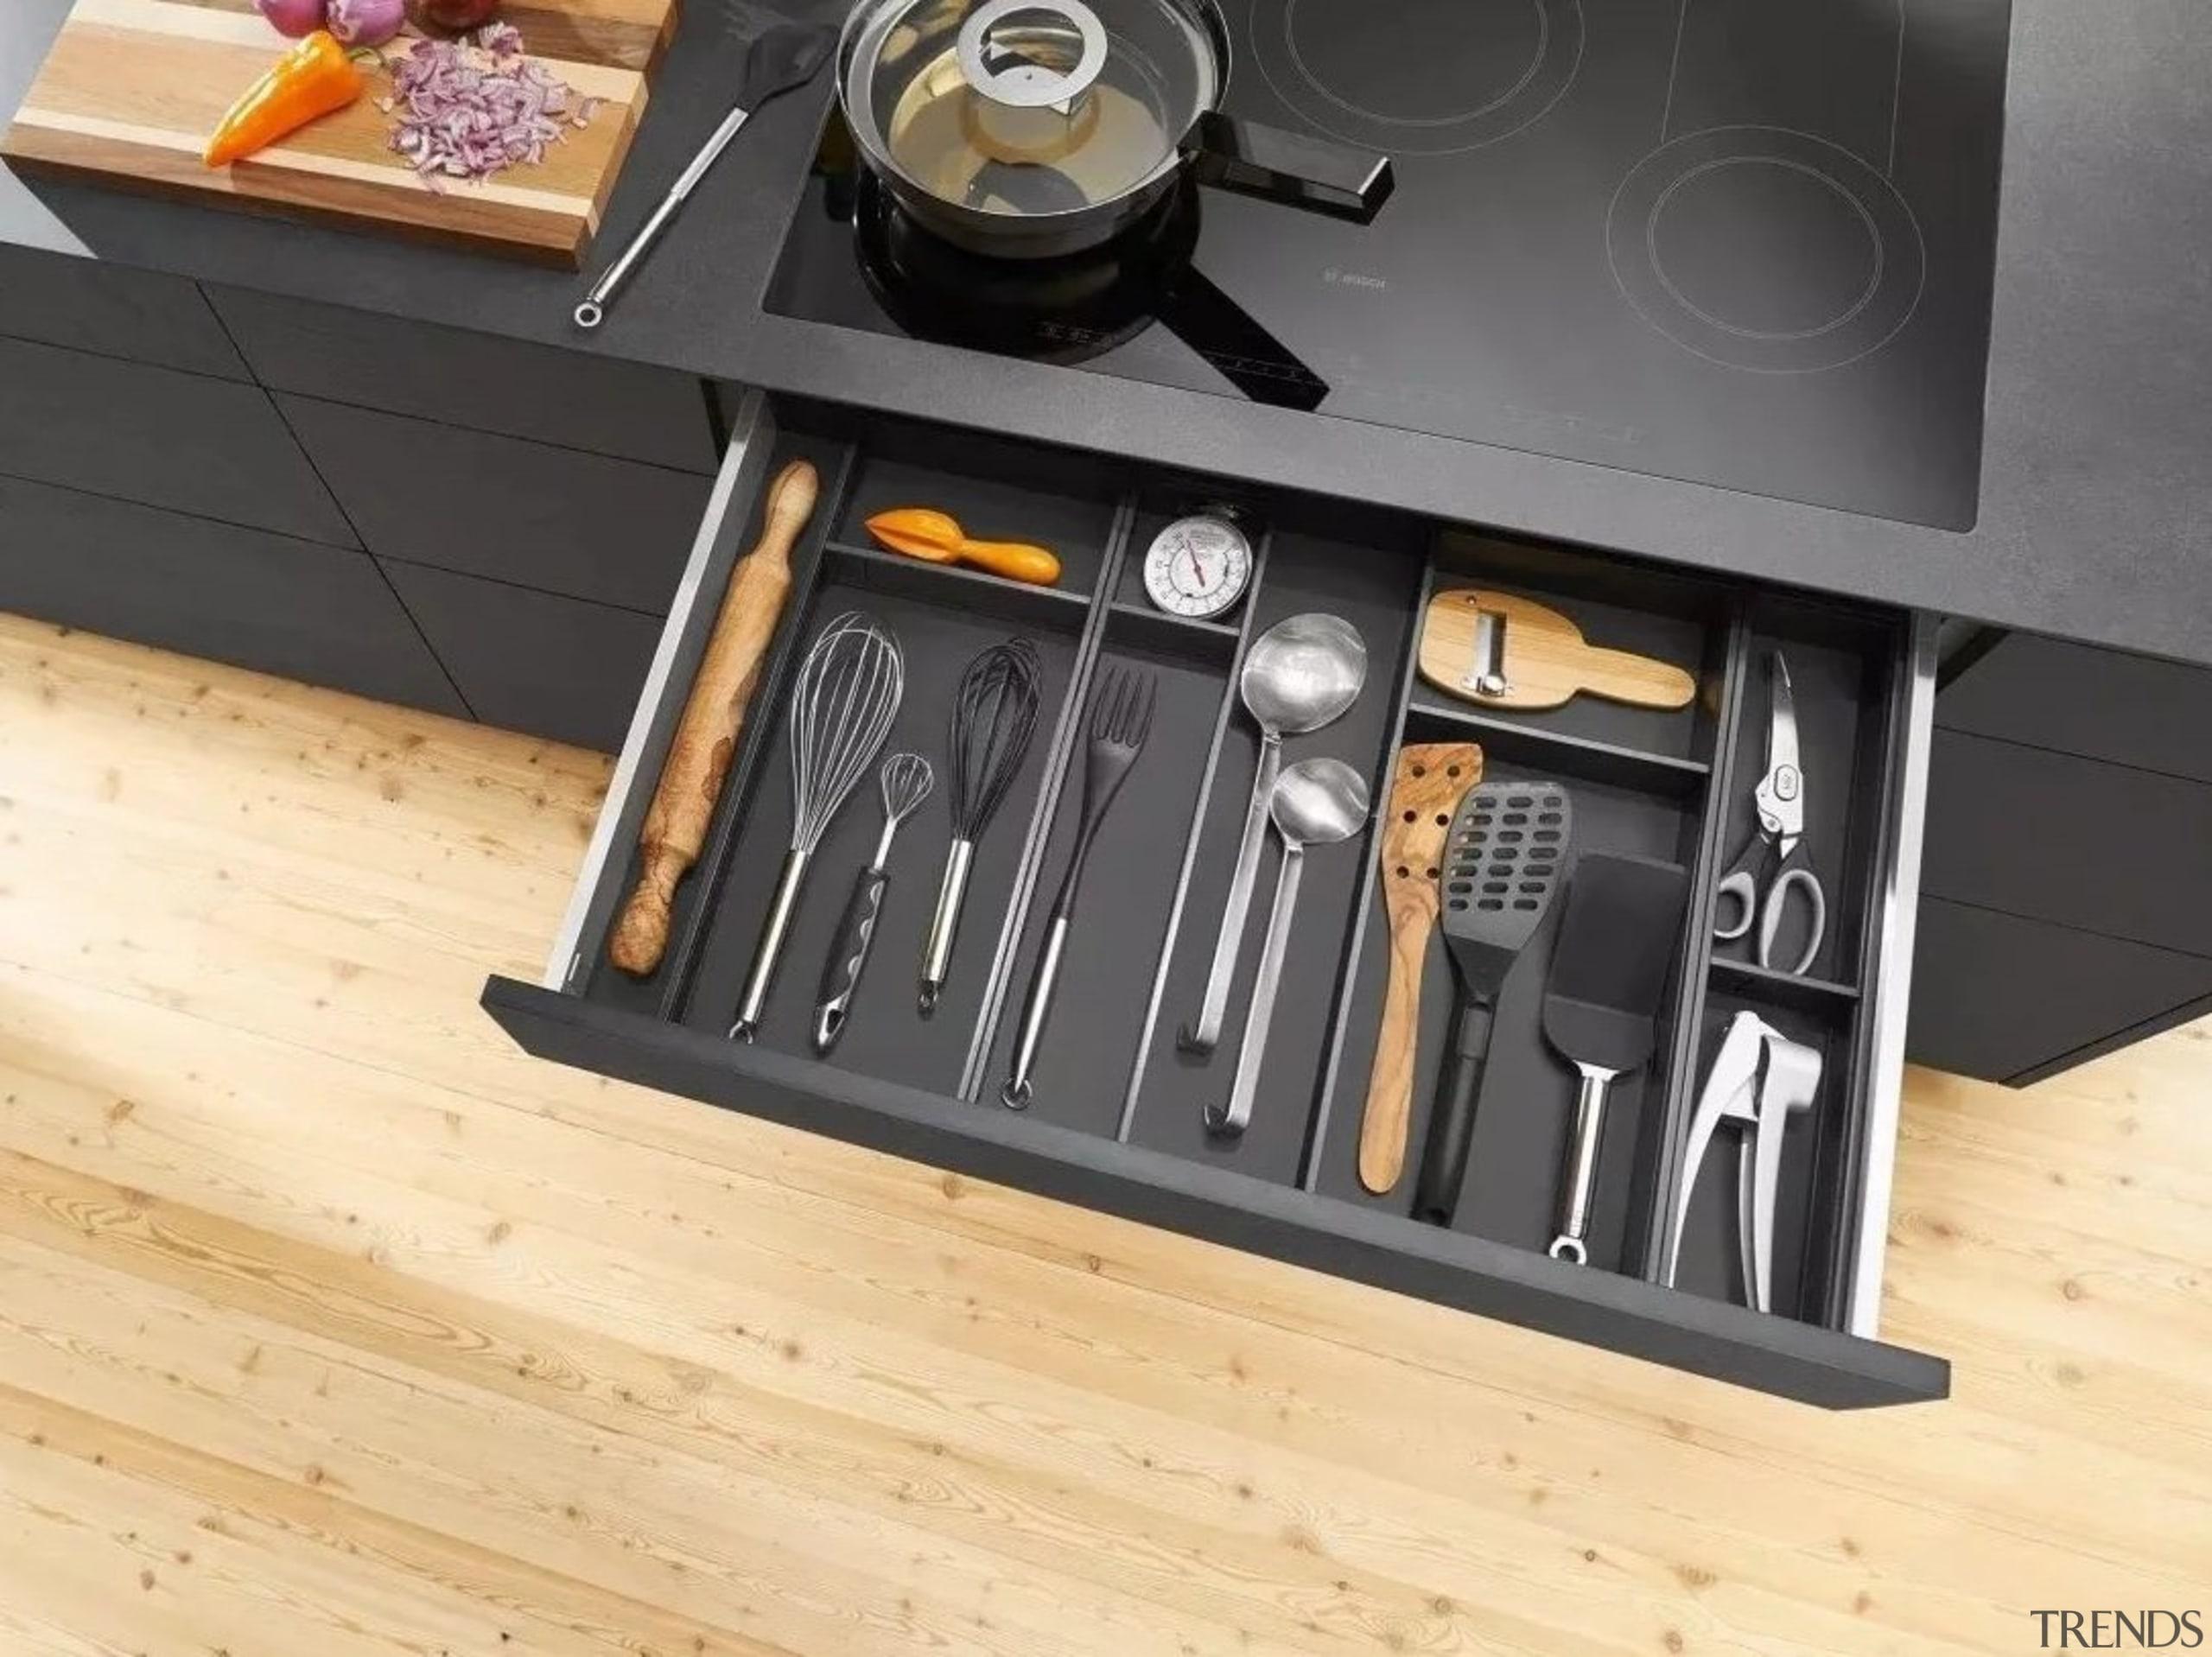 Image from: Blum New Zealand furniture, table, tool, orange, black